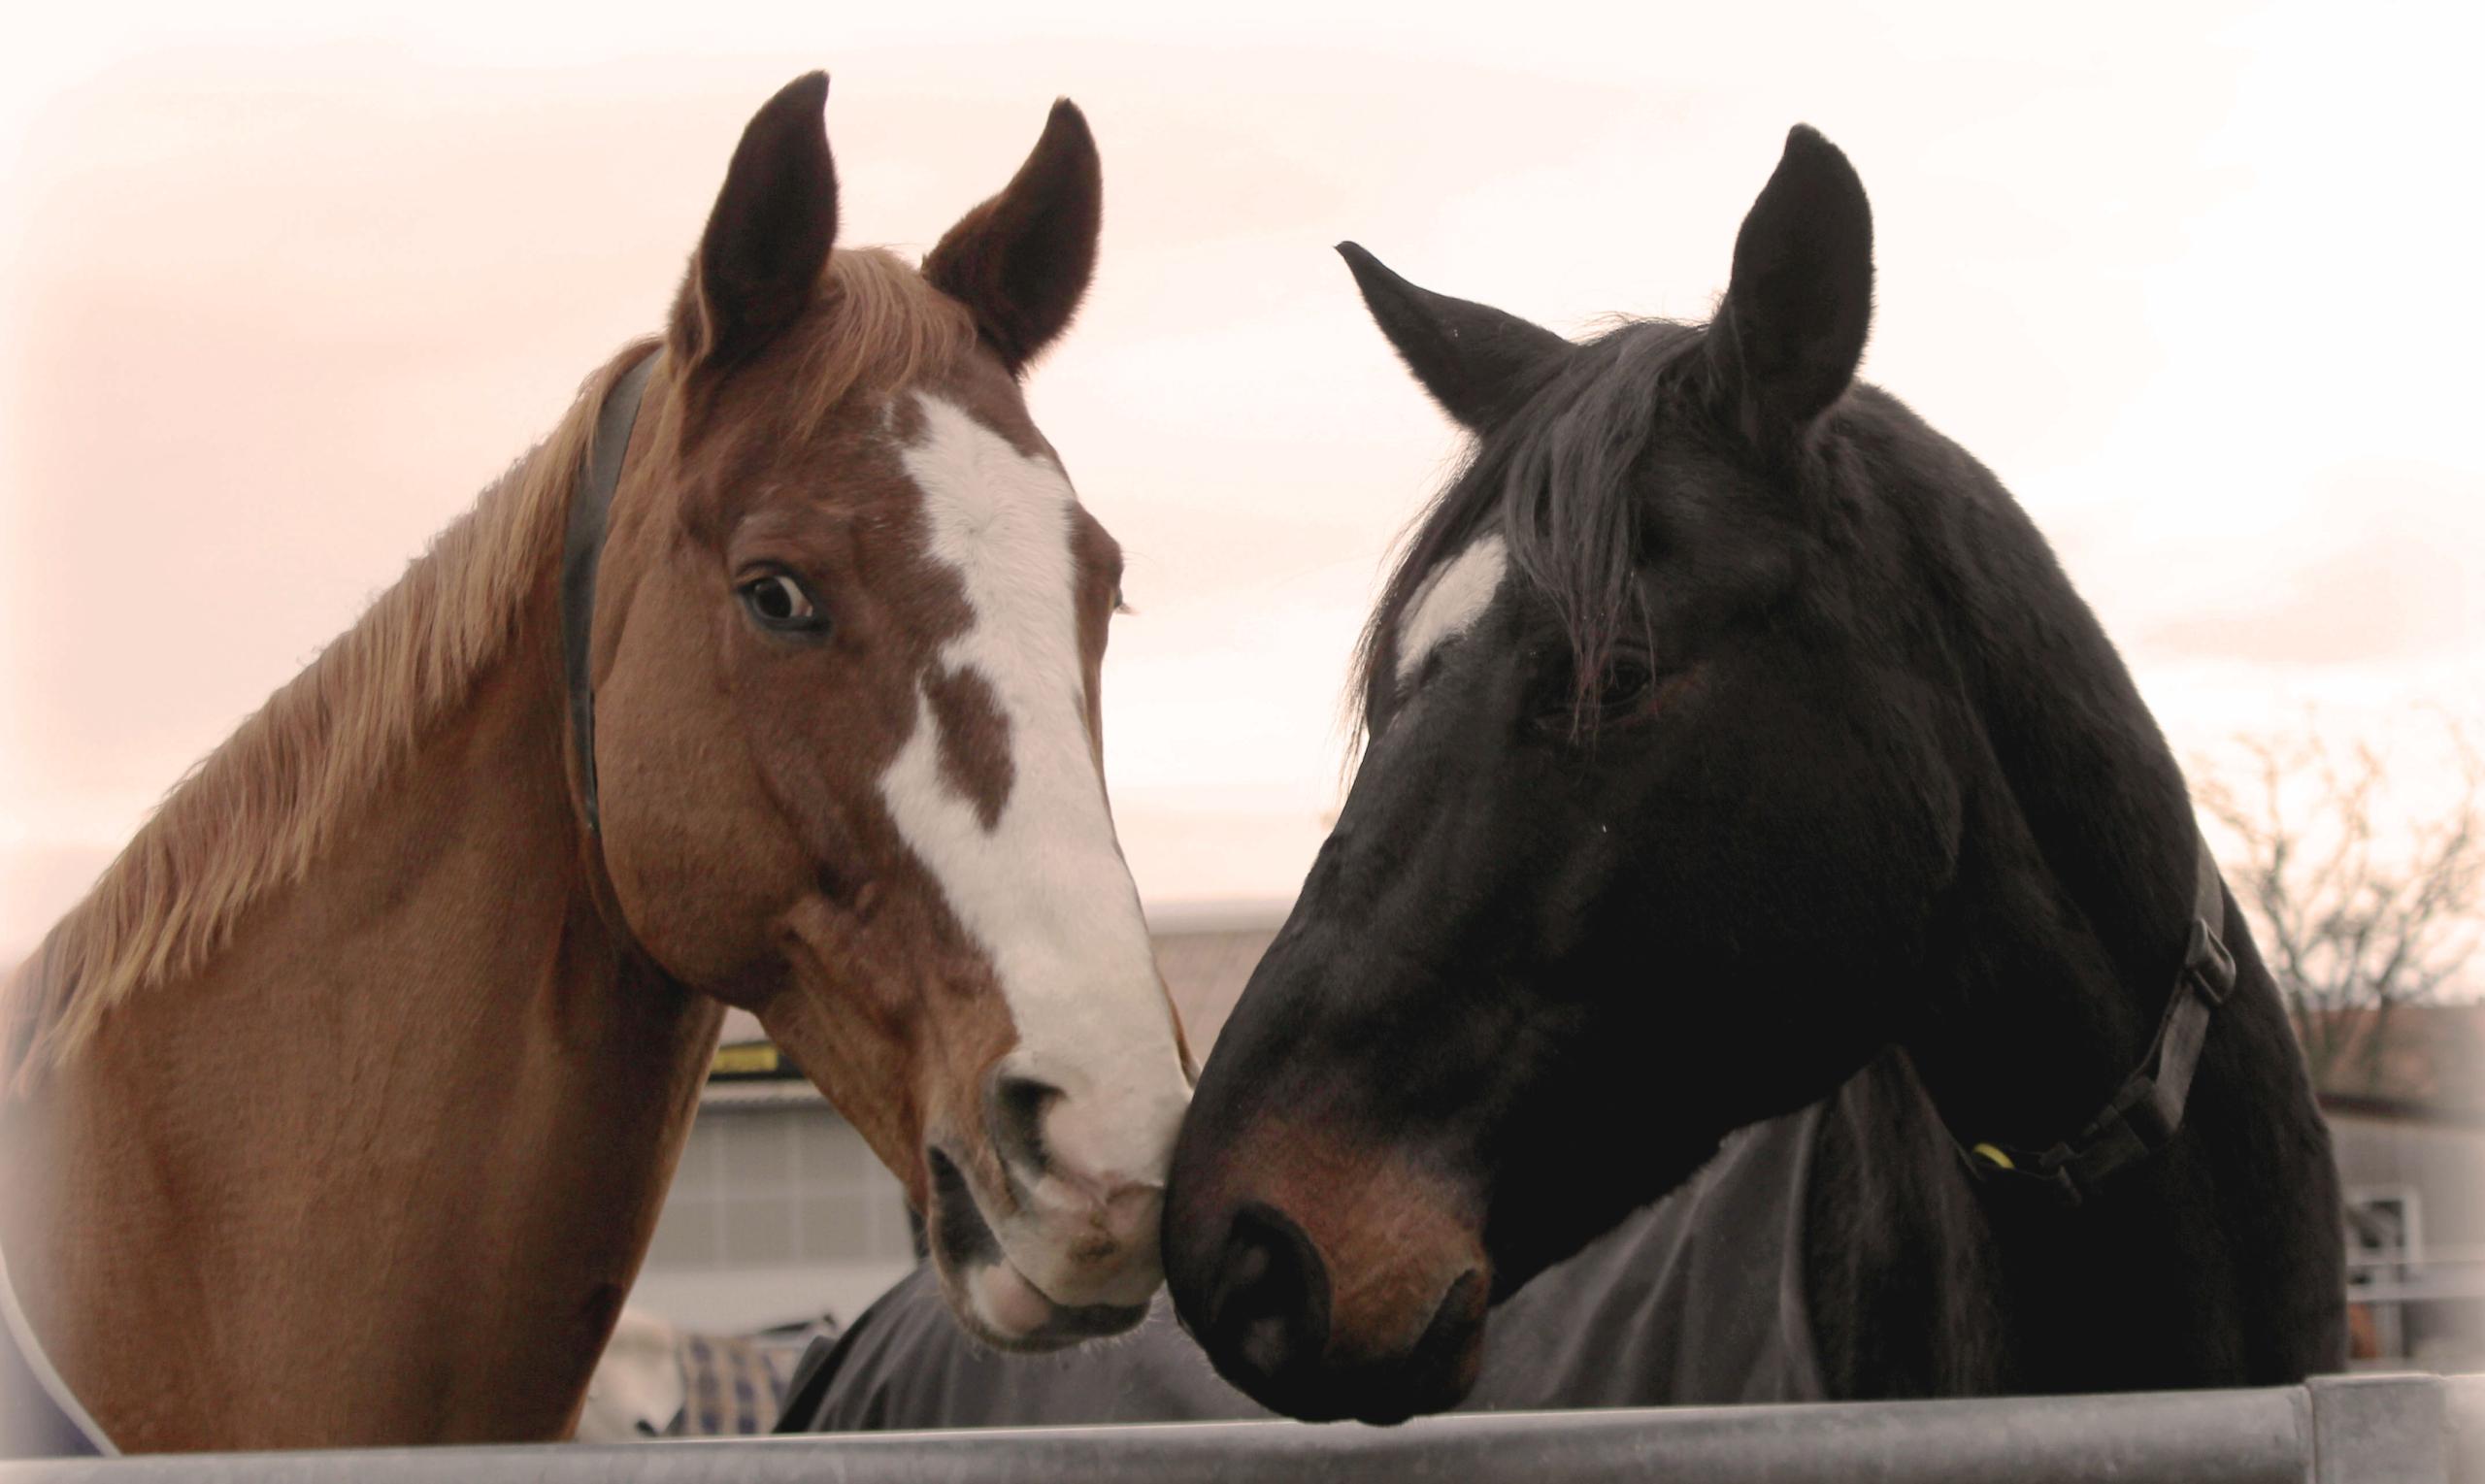 Pferde berühren sich an Nase